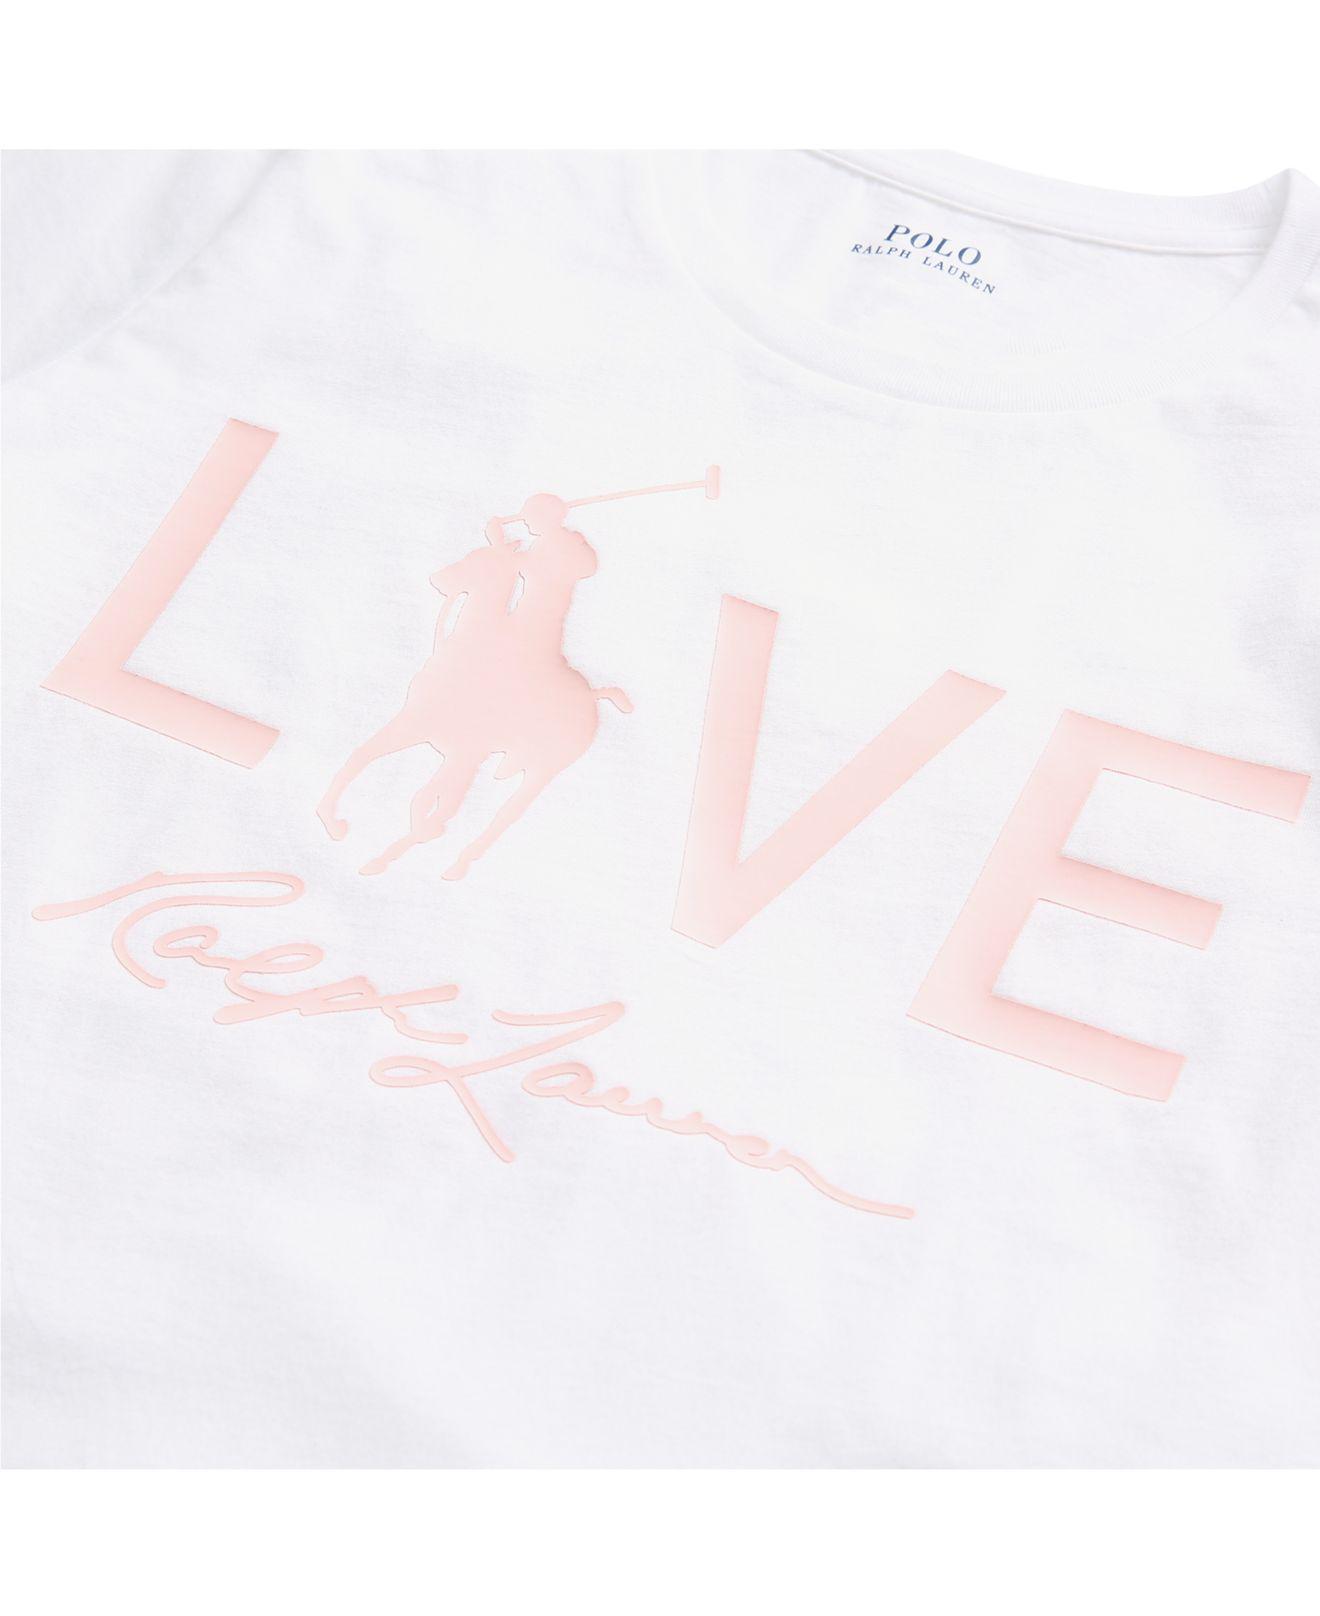 a1ba9b1c2 Polo Ralph Lauren - White Pink Pony Graphic Cotton T-shirt - Lyst. View  fullscreen